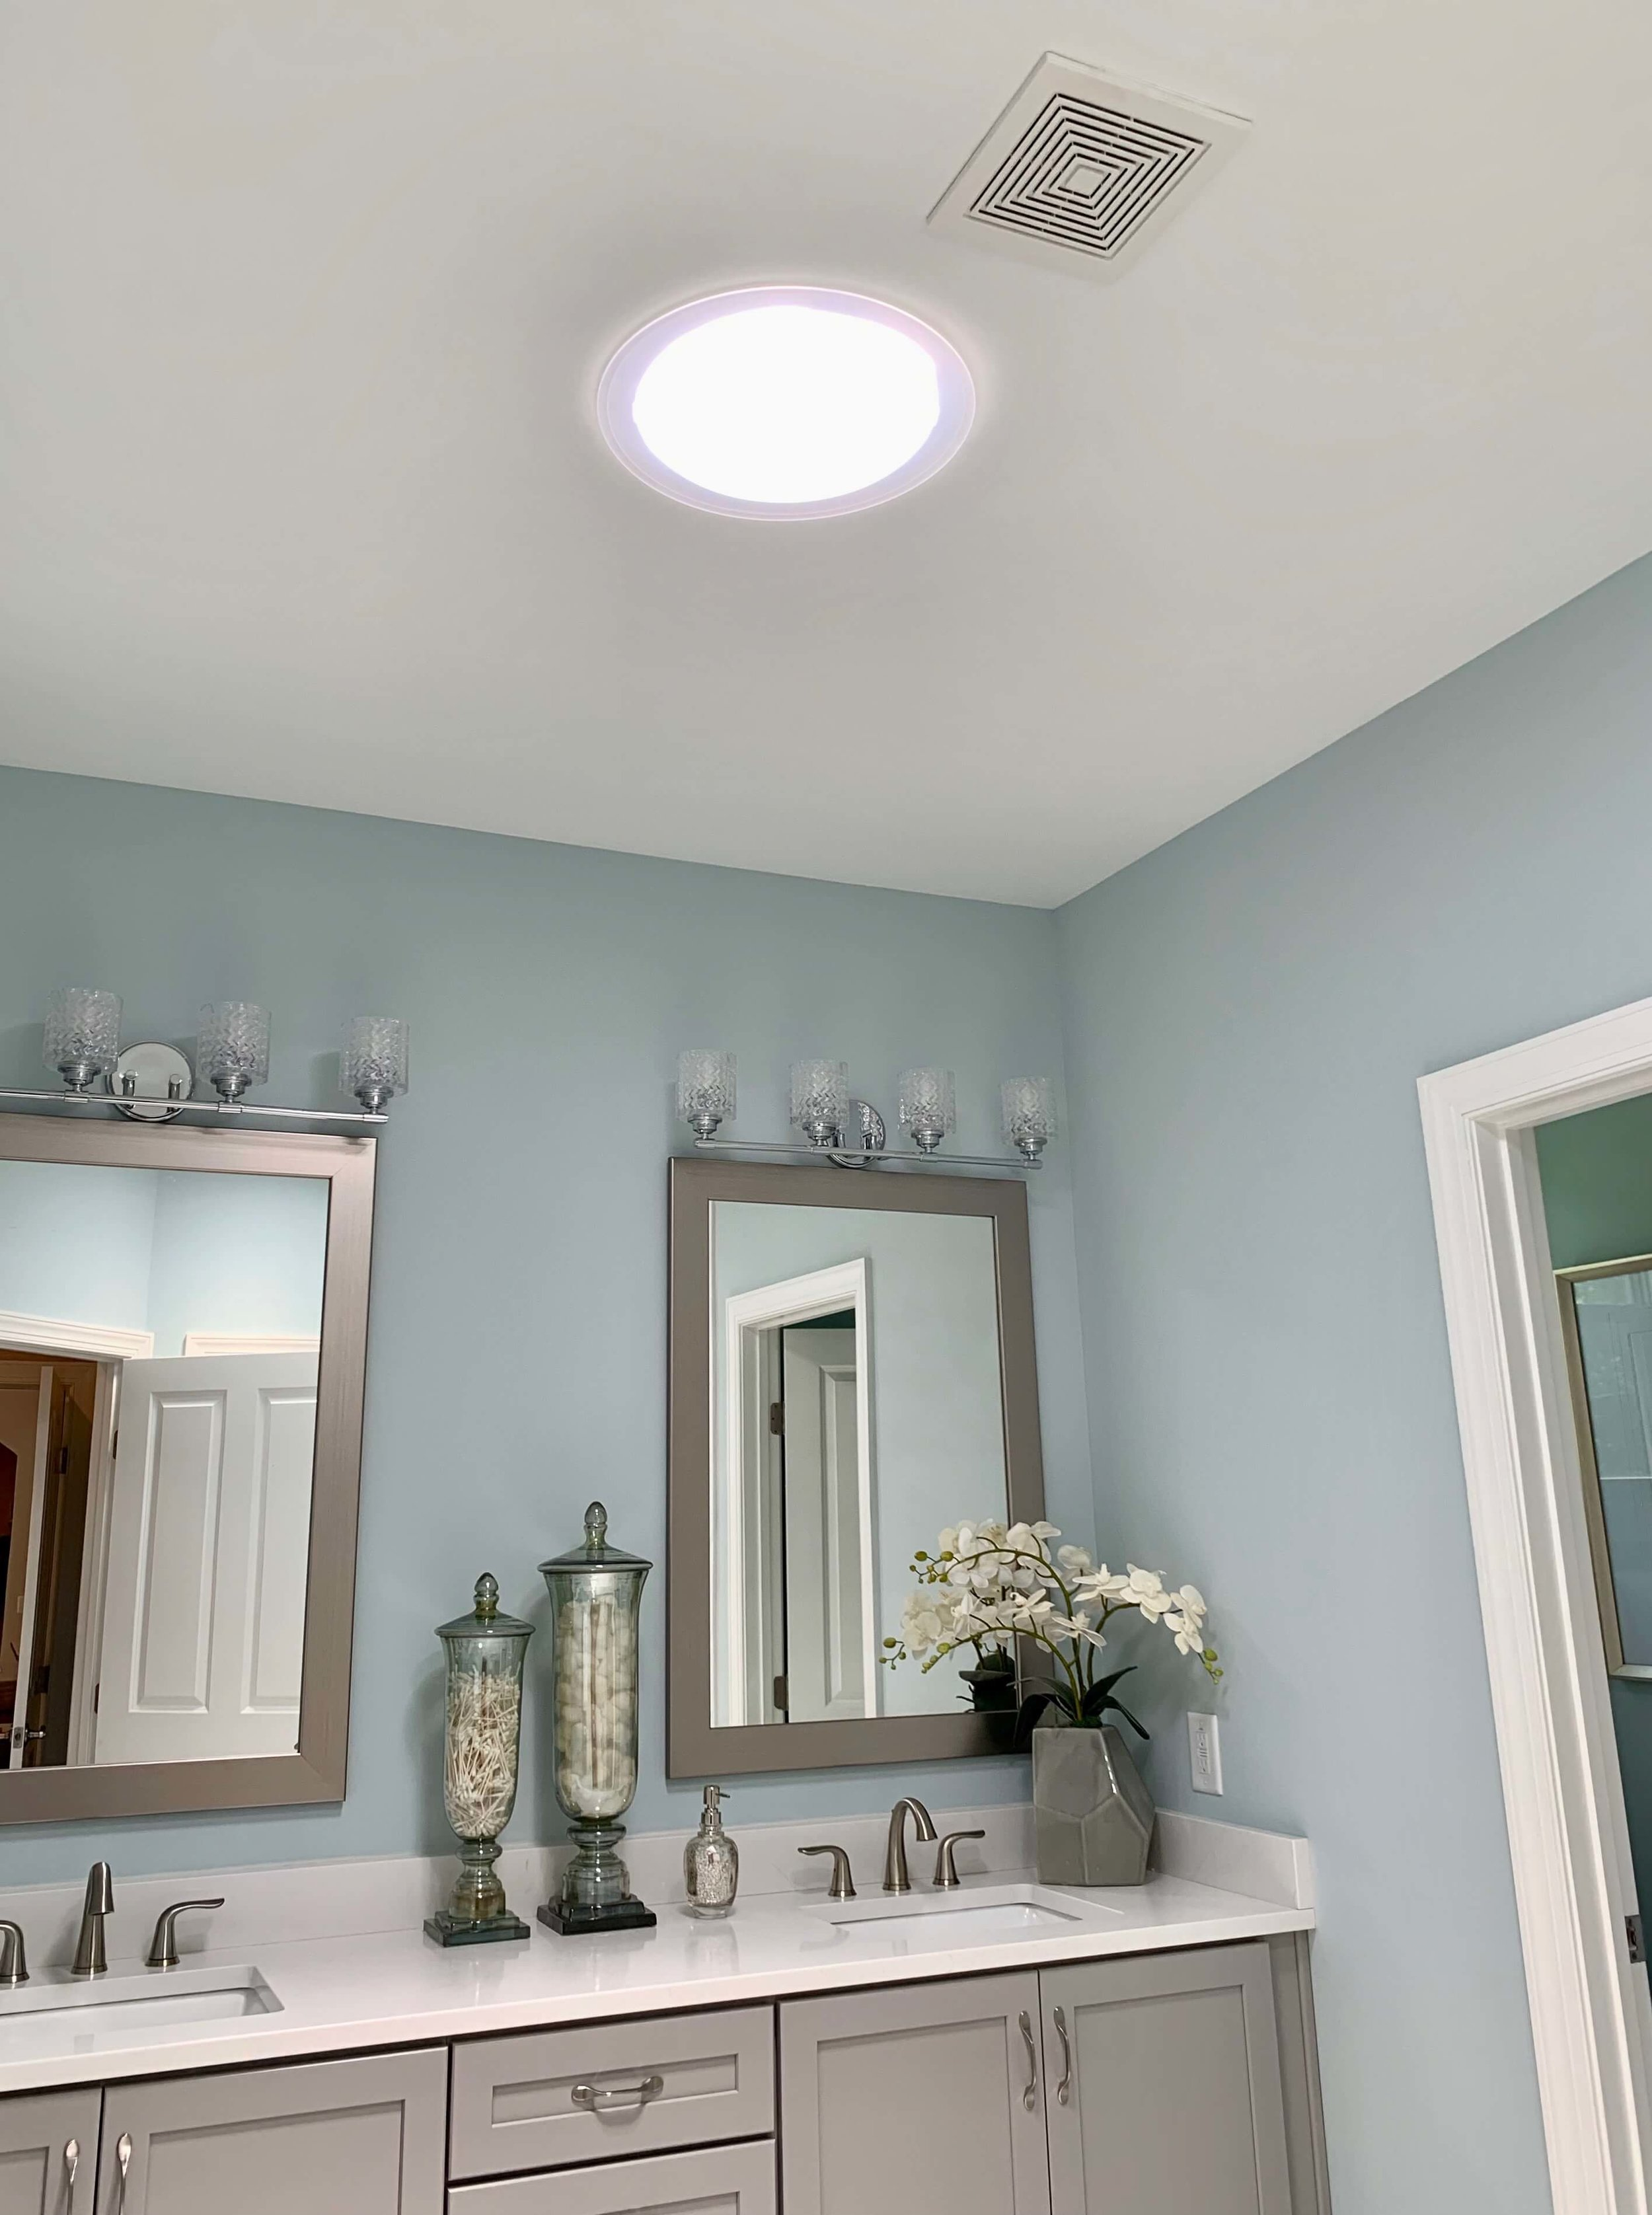 model_home_decorating_solar_tube.jpeg